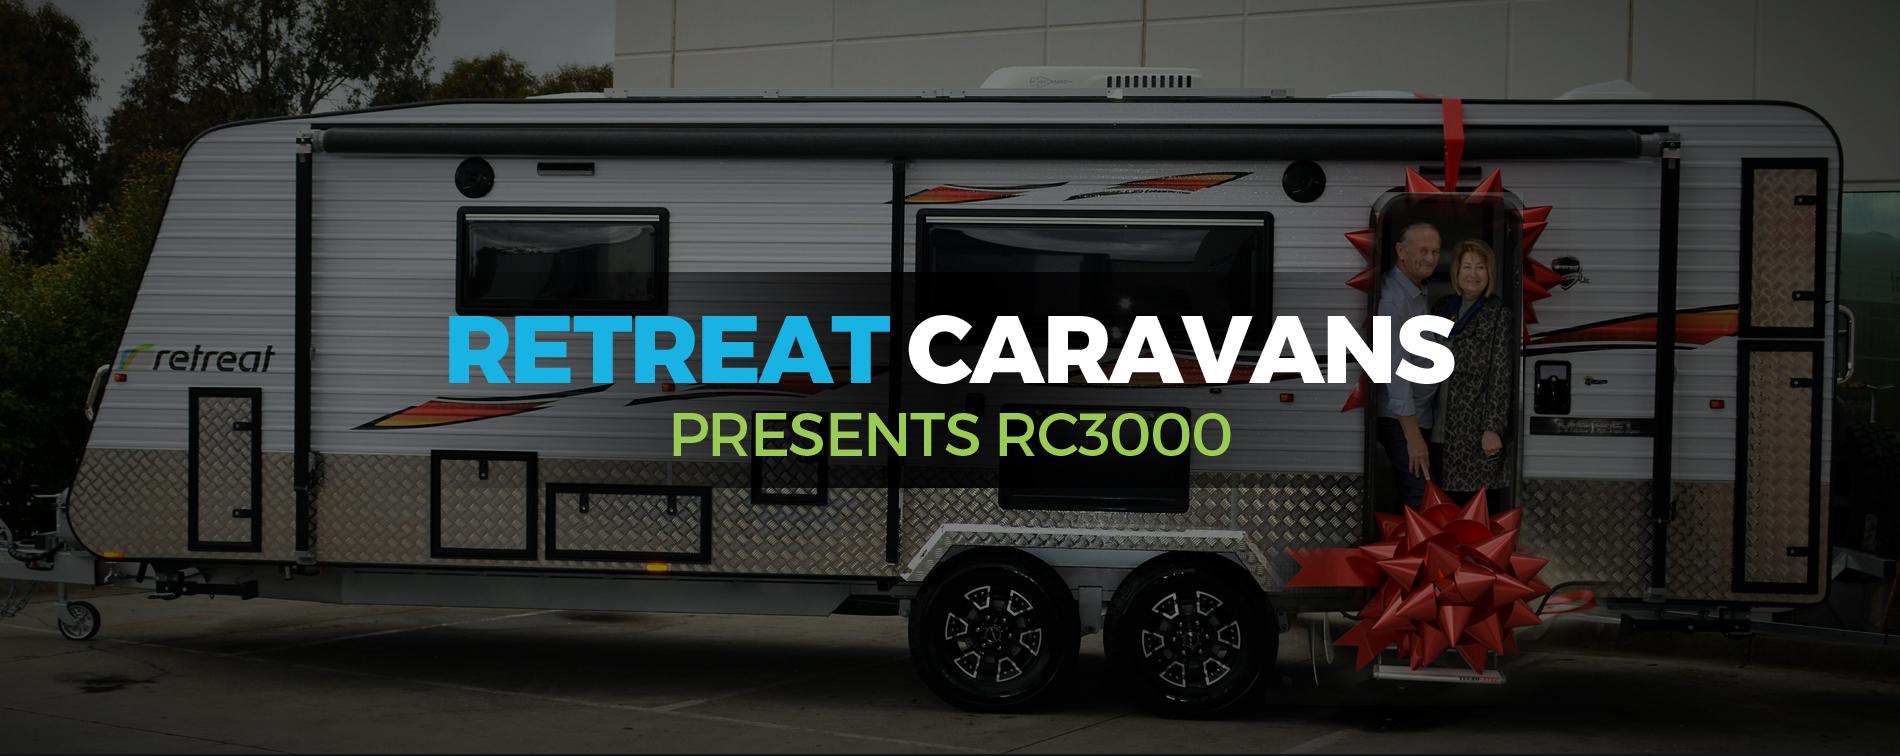 RC300 Caravan